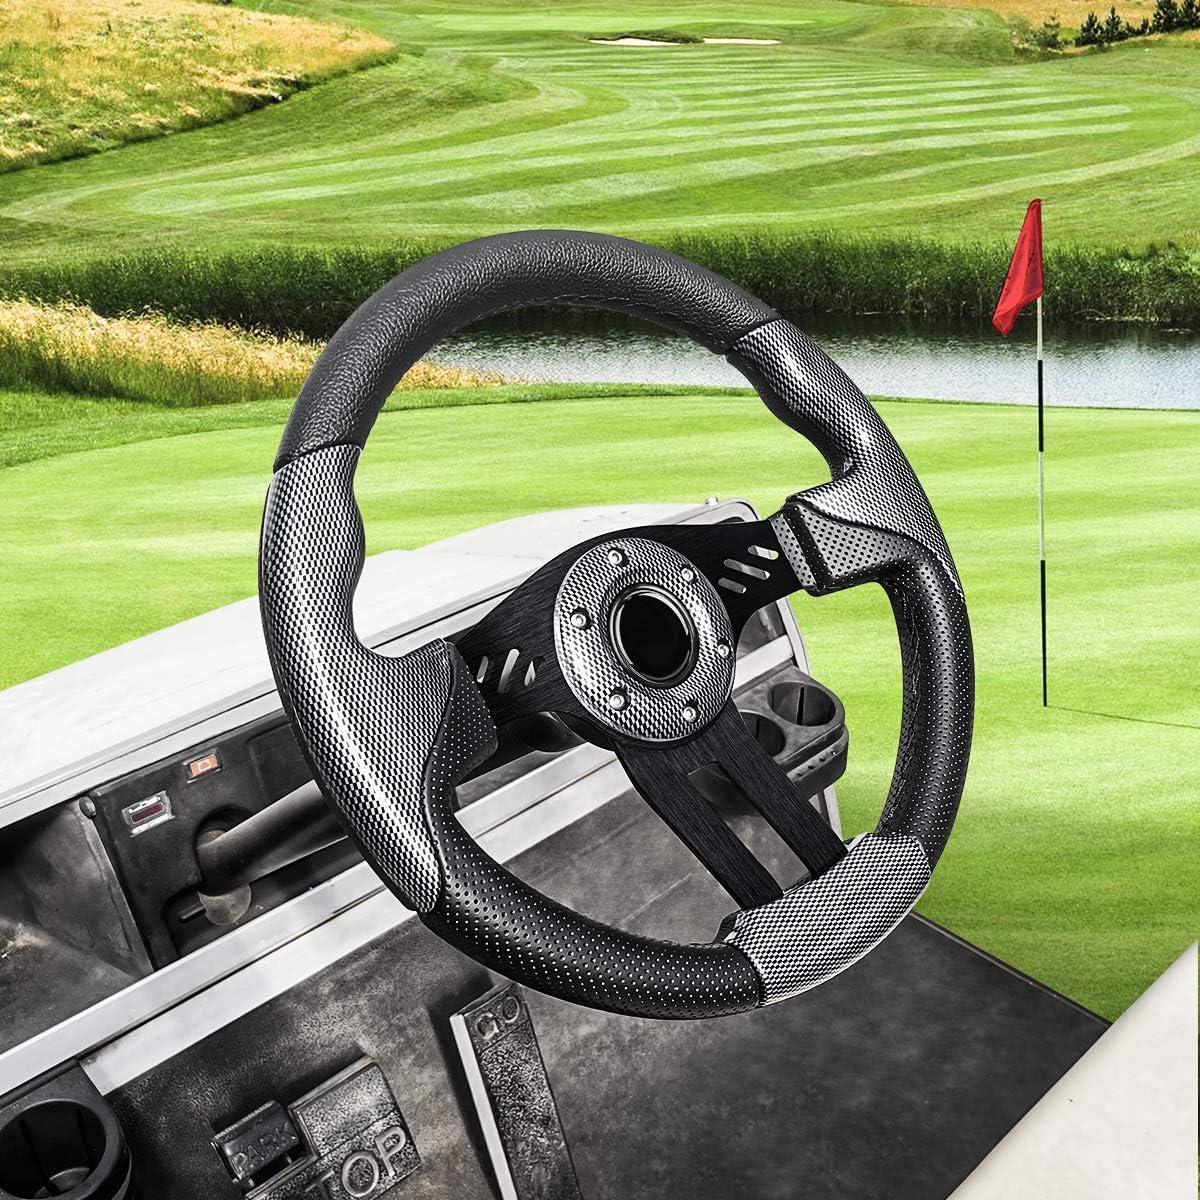 Club Car Accessories (Buying Guide 2021) - Steering Wheels